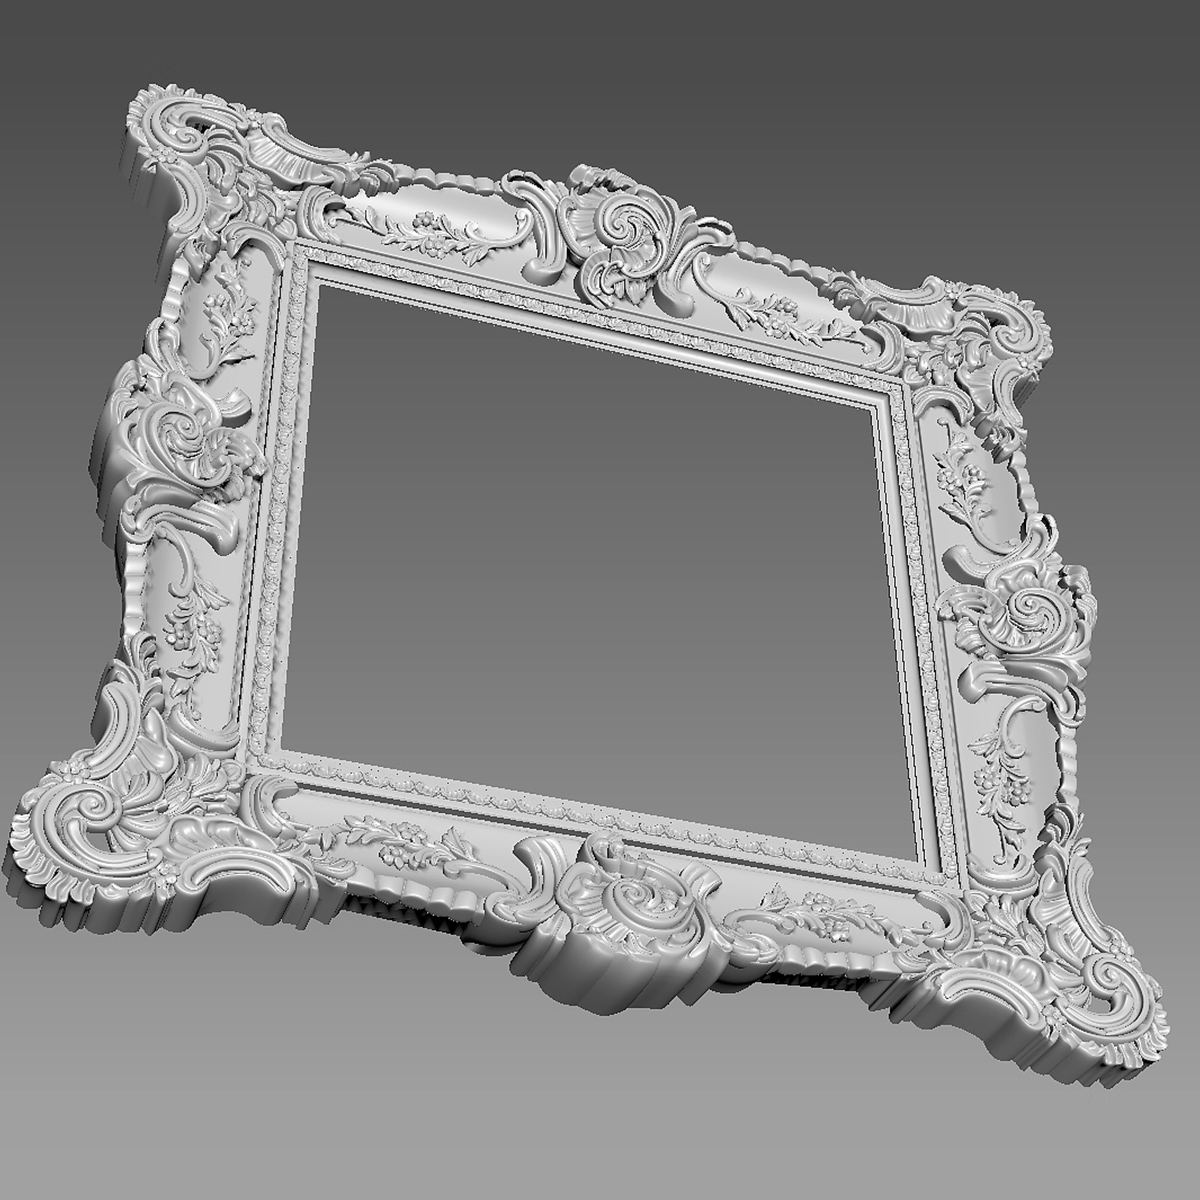 3D model in 3d max vray 3.0 image